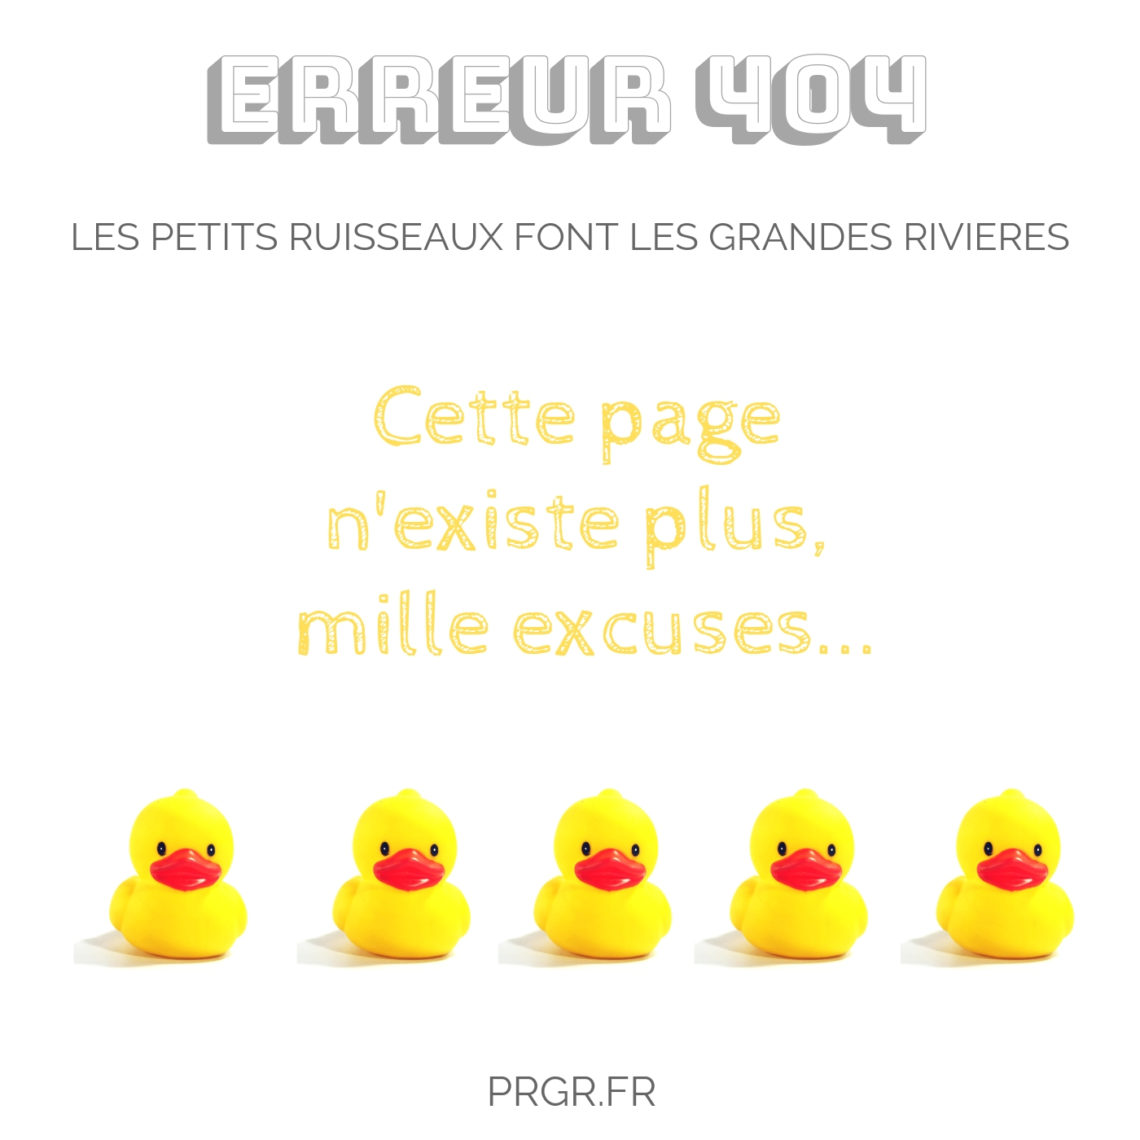 erreur404 erreur 404 blog maman blog famille recomposée blog les petits ruisseaux font les grandes rivieres blog PRGR https://prgr.fr